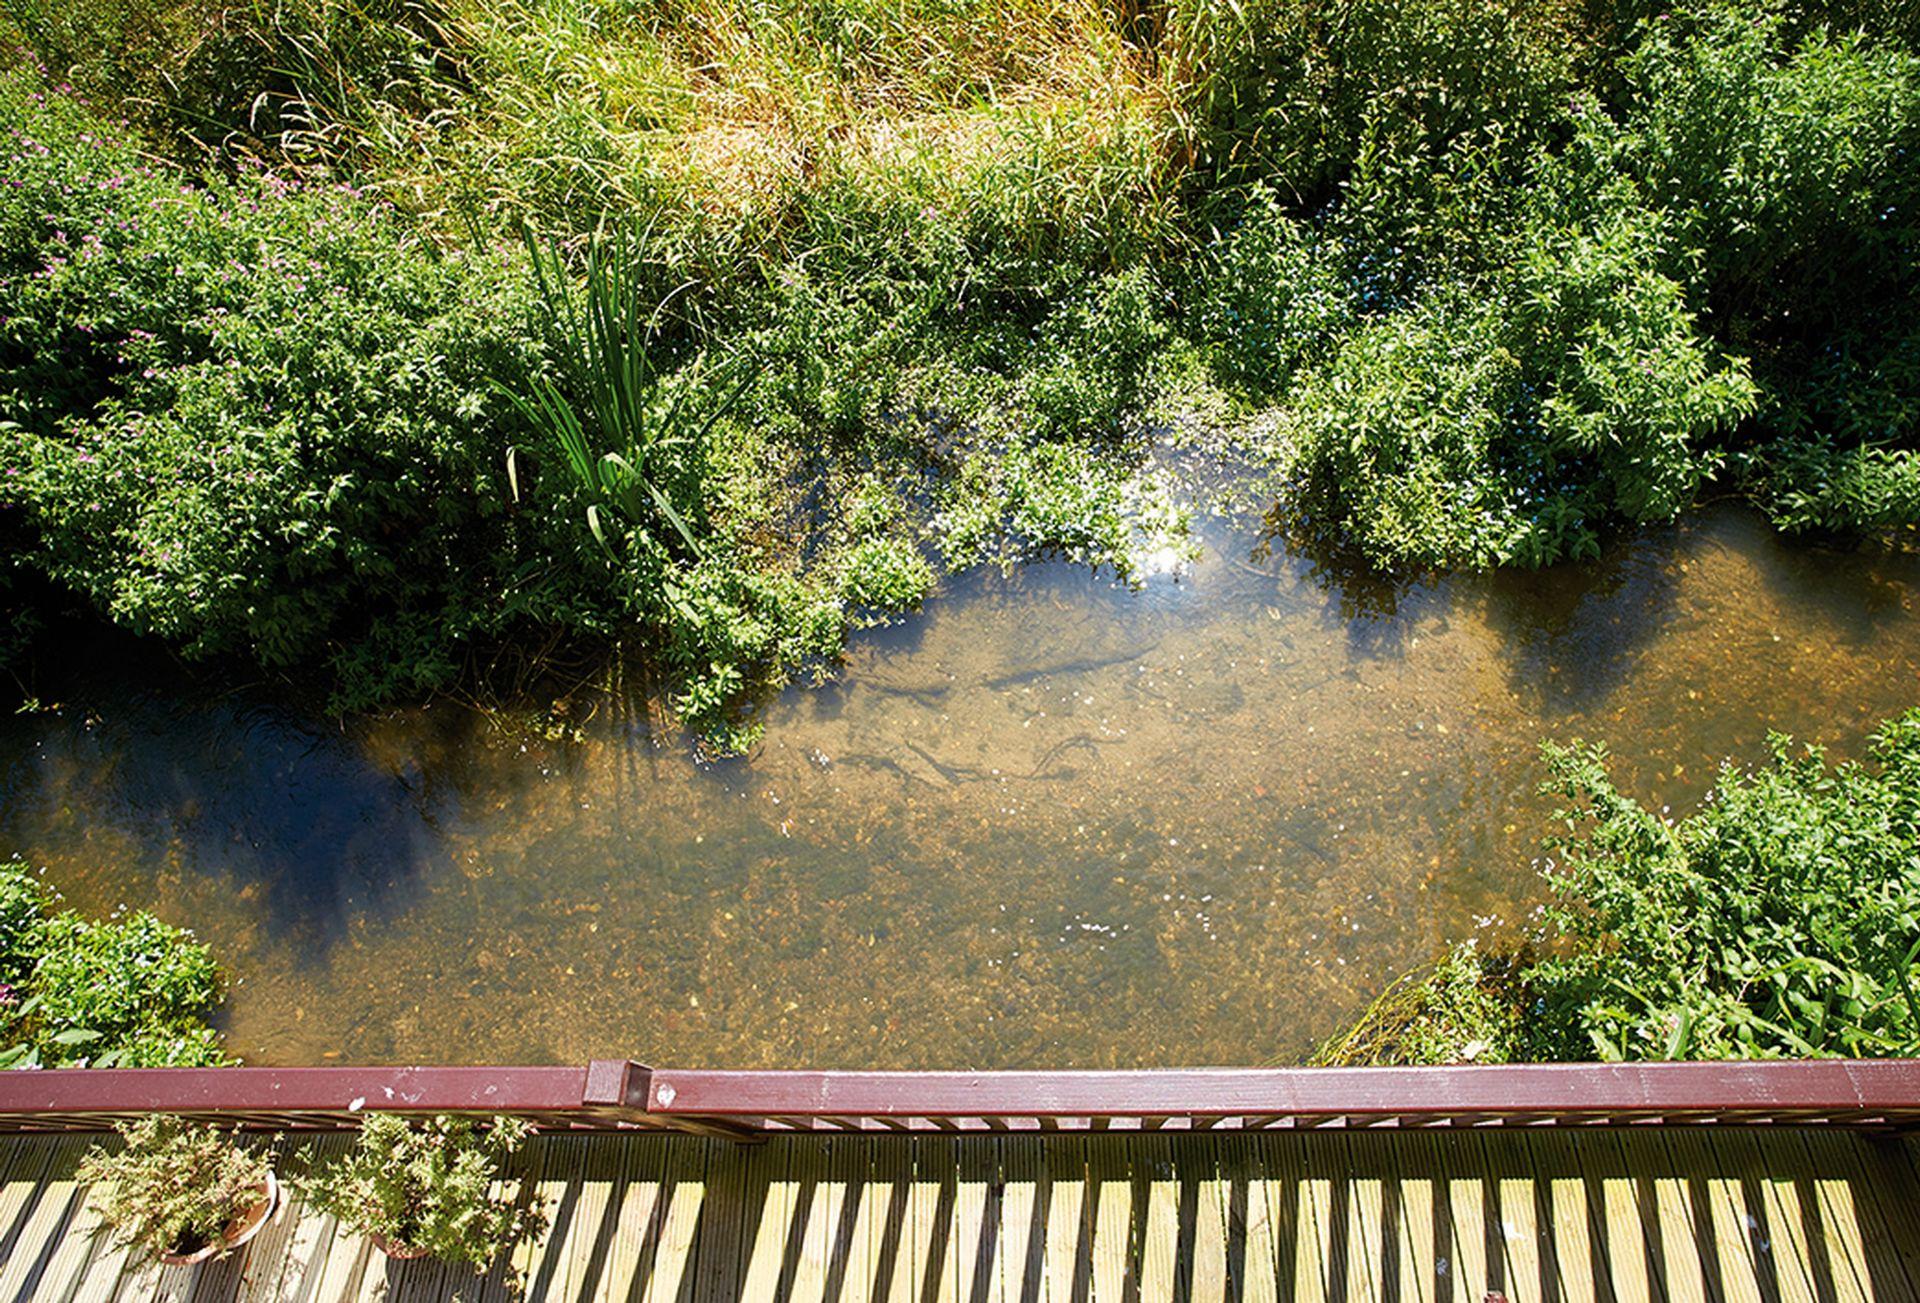 Overlooking the stream